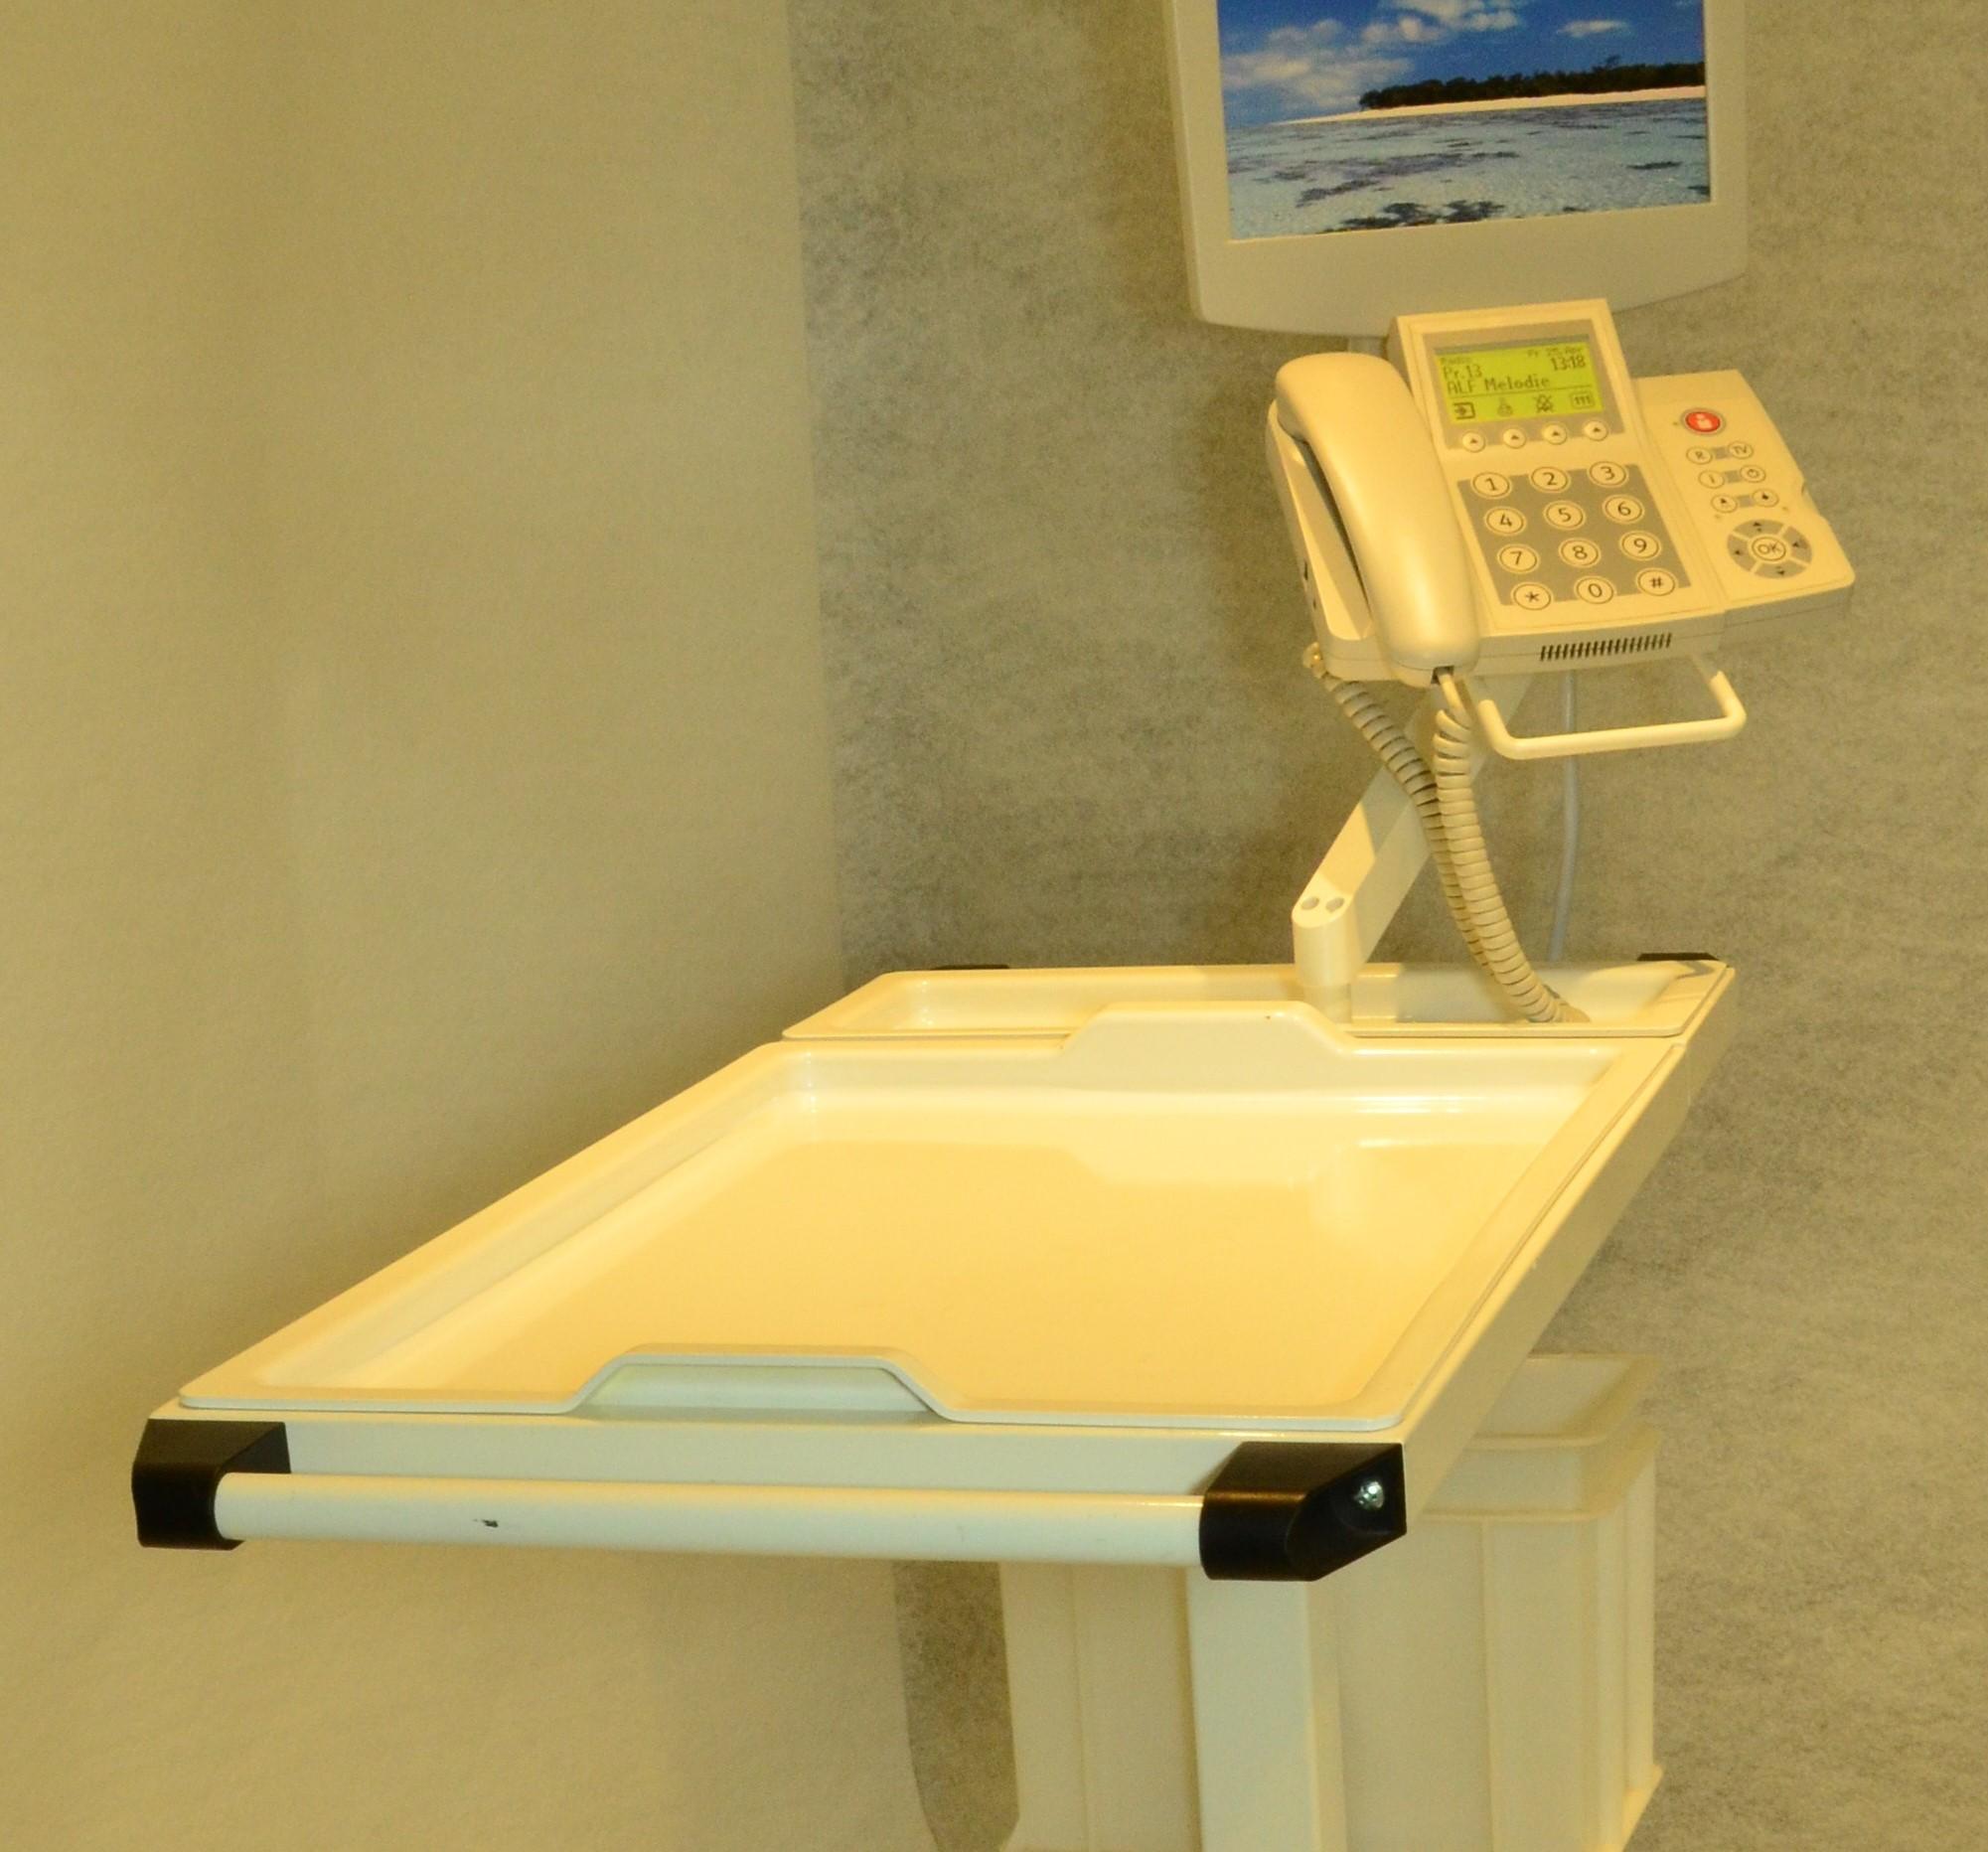 Spital-Mobiliar aus Hart-PVC / Verbund